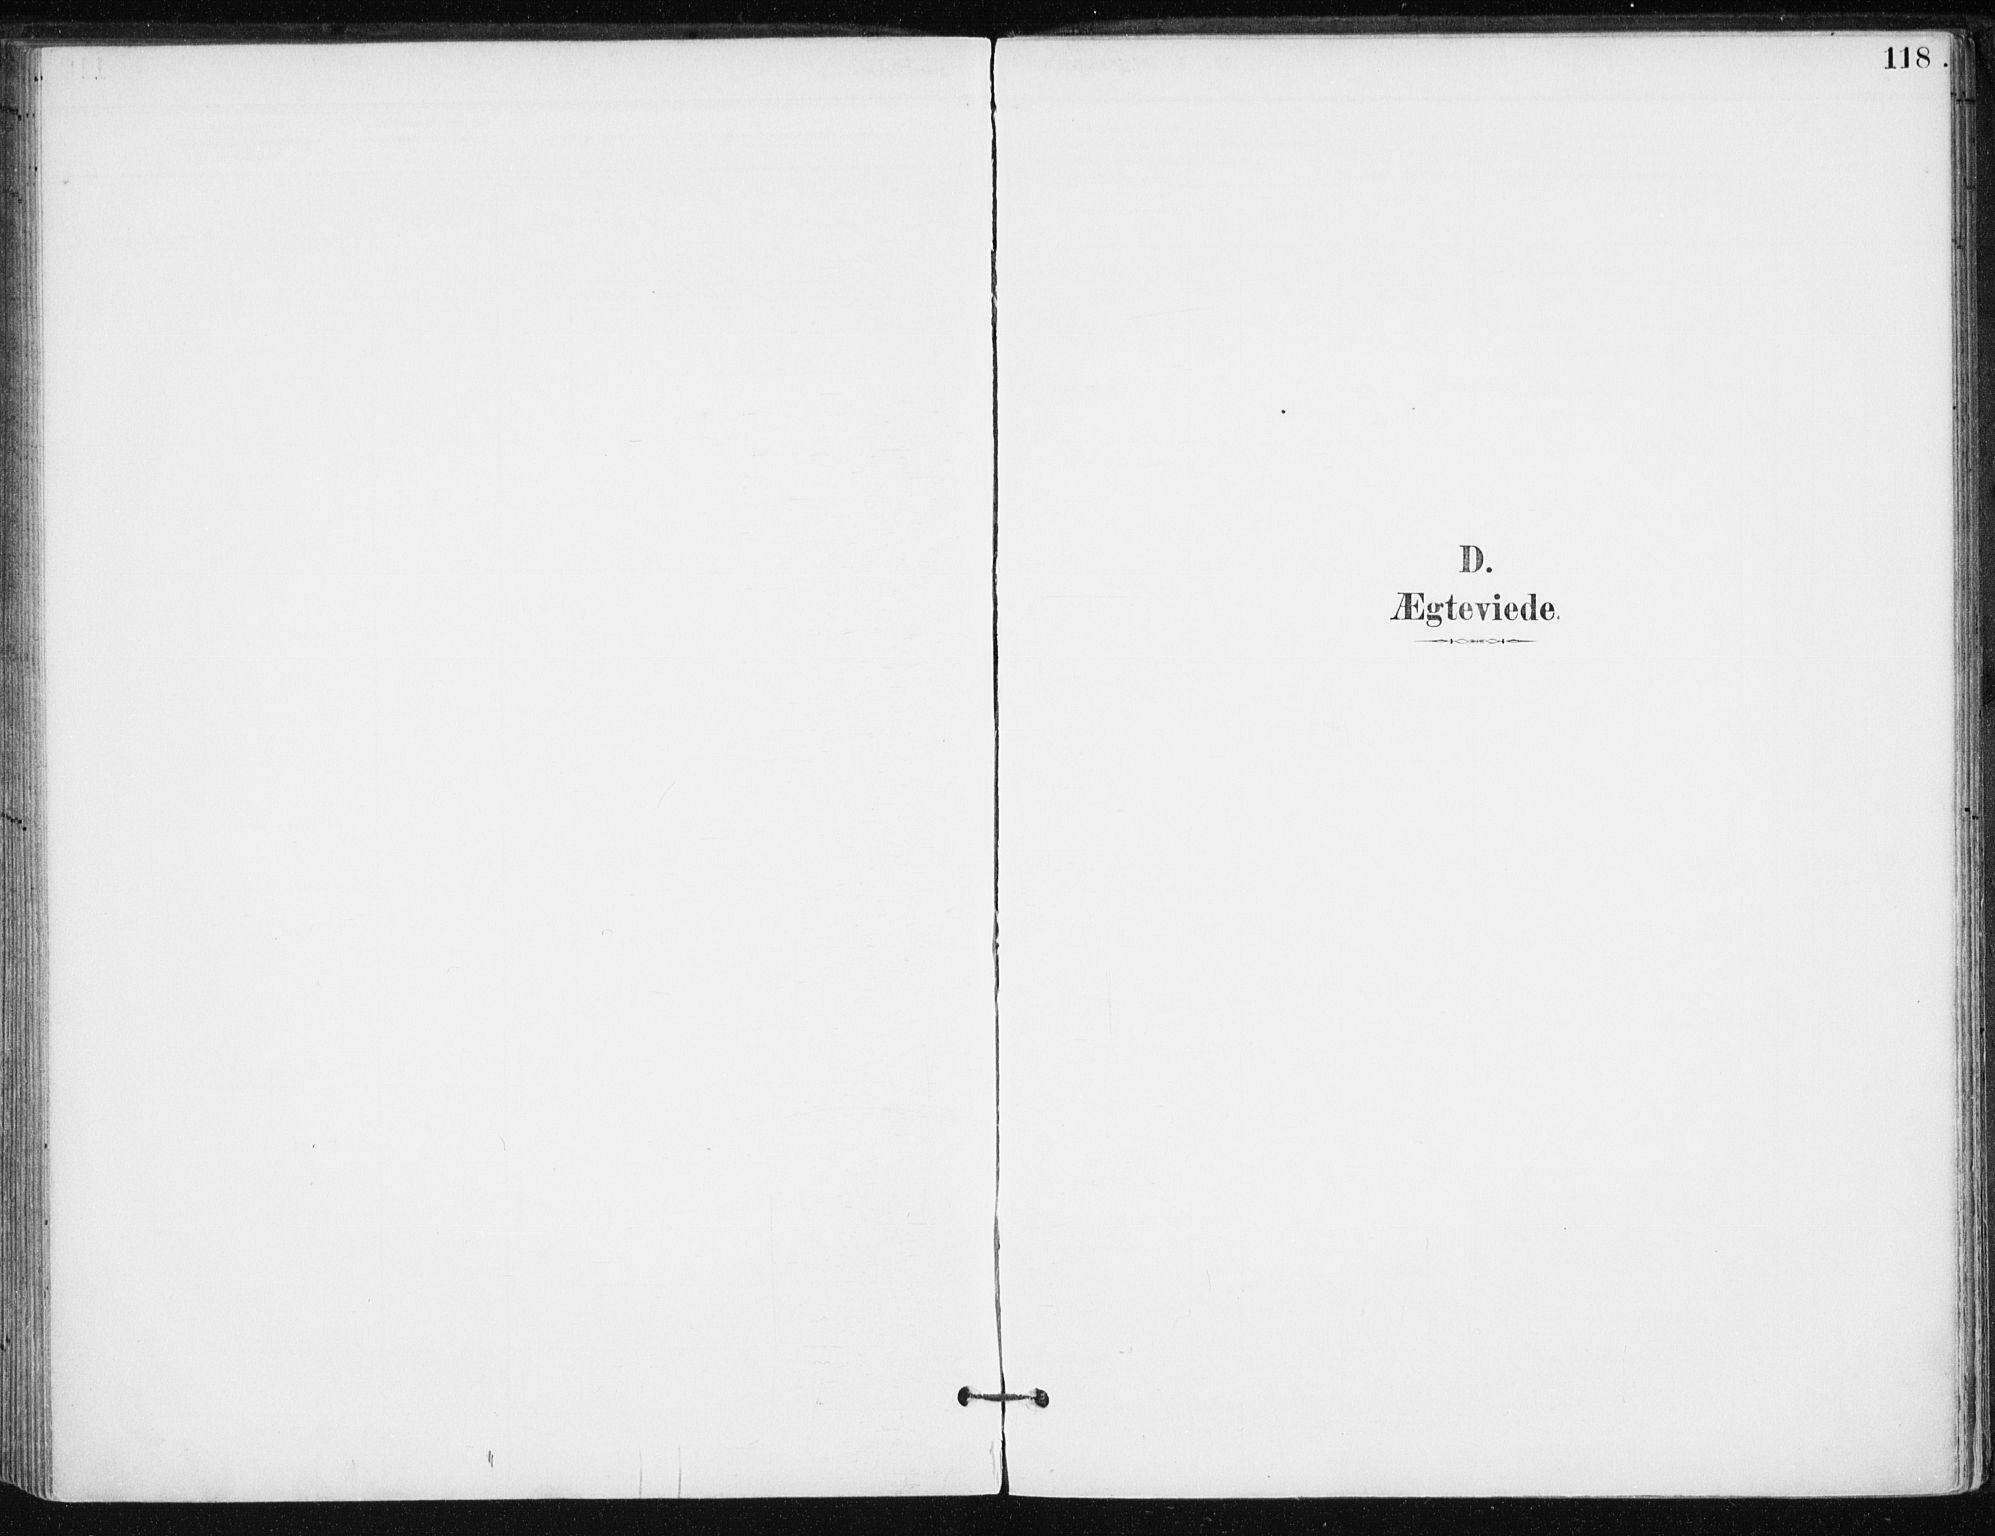 SATØ, Salangen sokneprestembete, Ministerialbok nr. 1, 1893-1911, s. 118